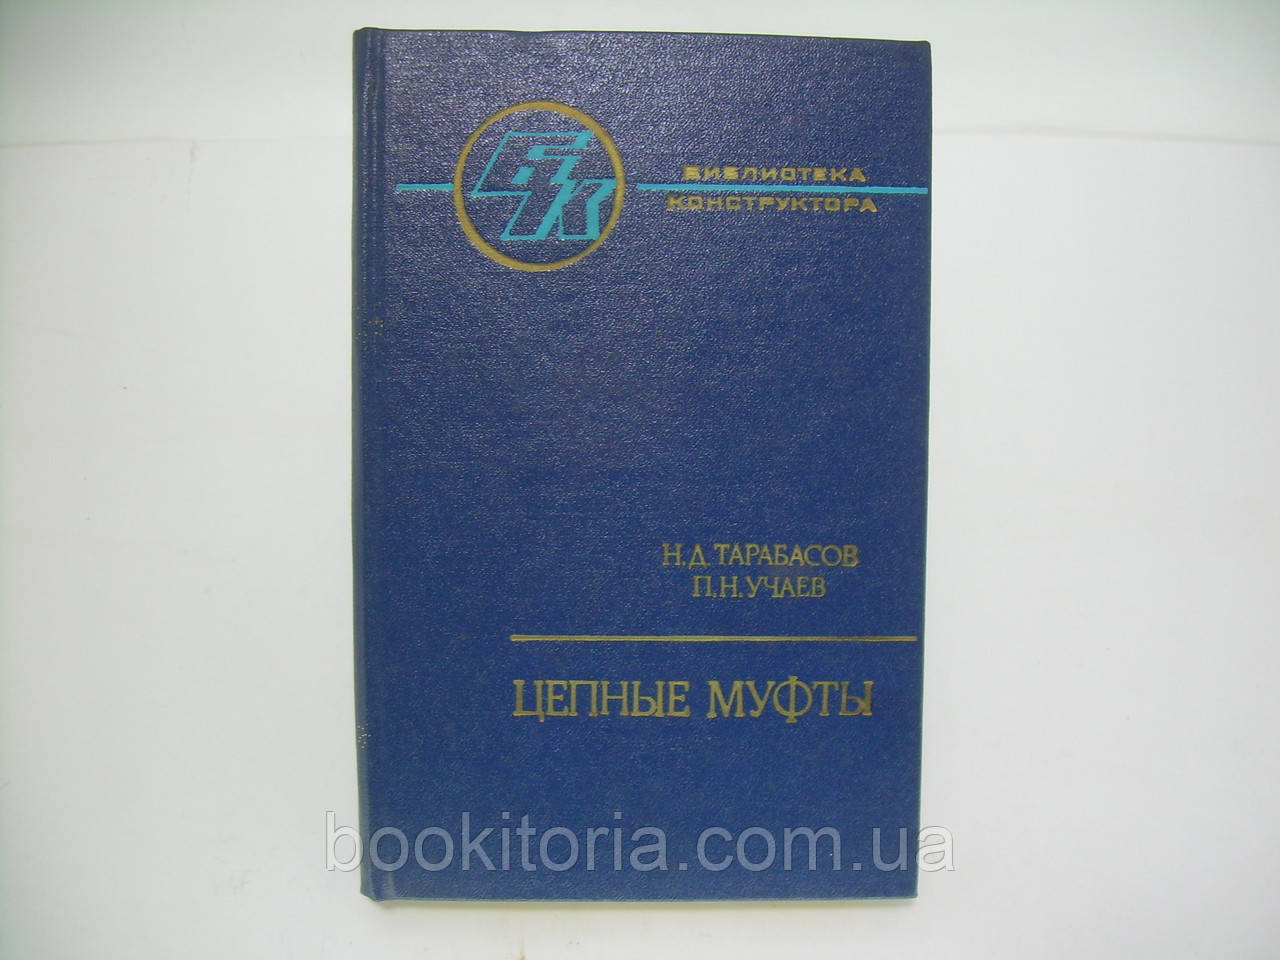 Тарабасов Н.Д., Учаев П.Н. Цепные муфты (б/у).